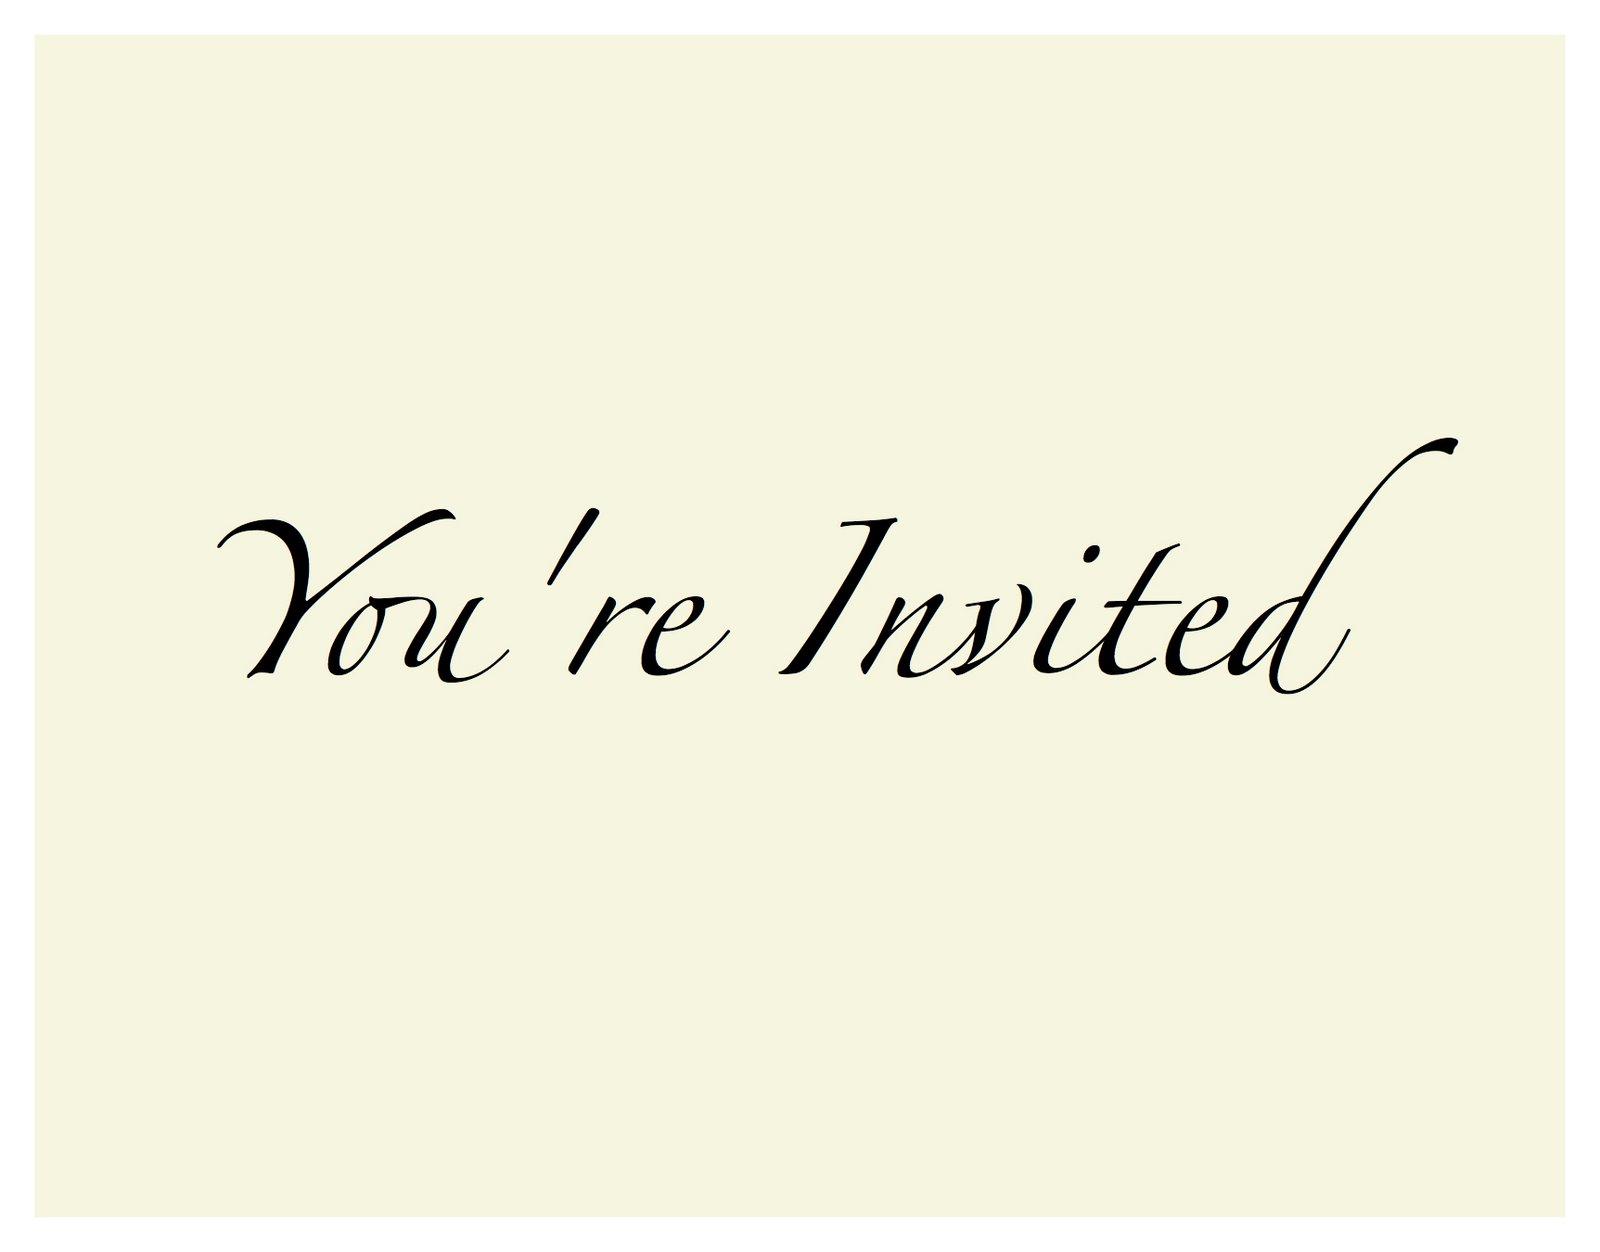 salem s lot 14 personal invite